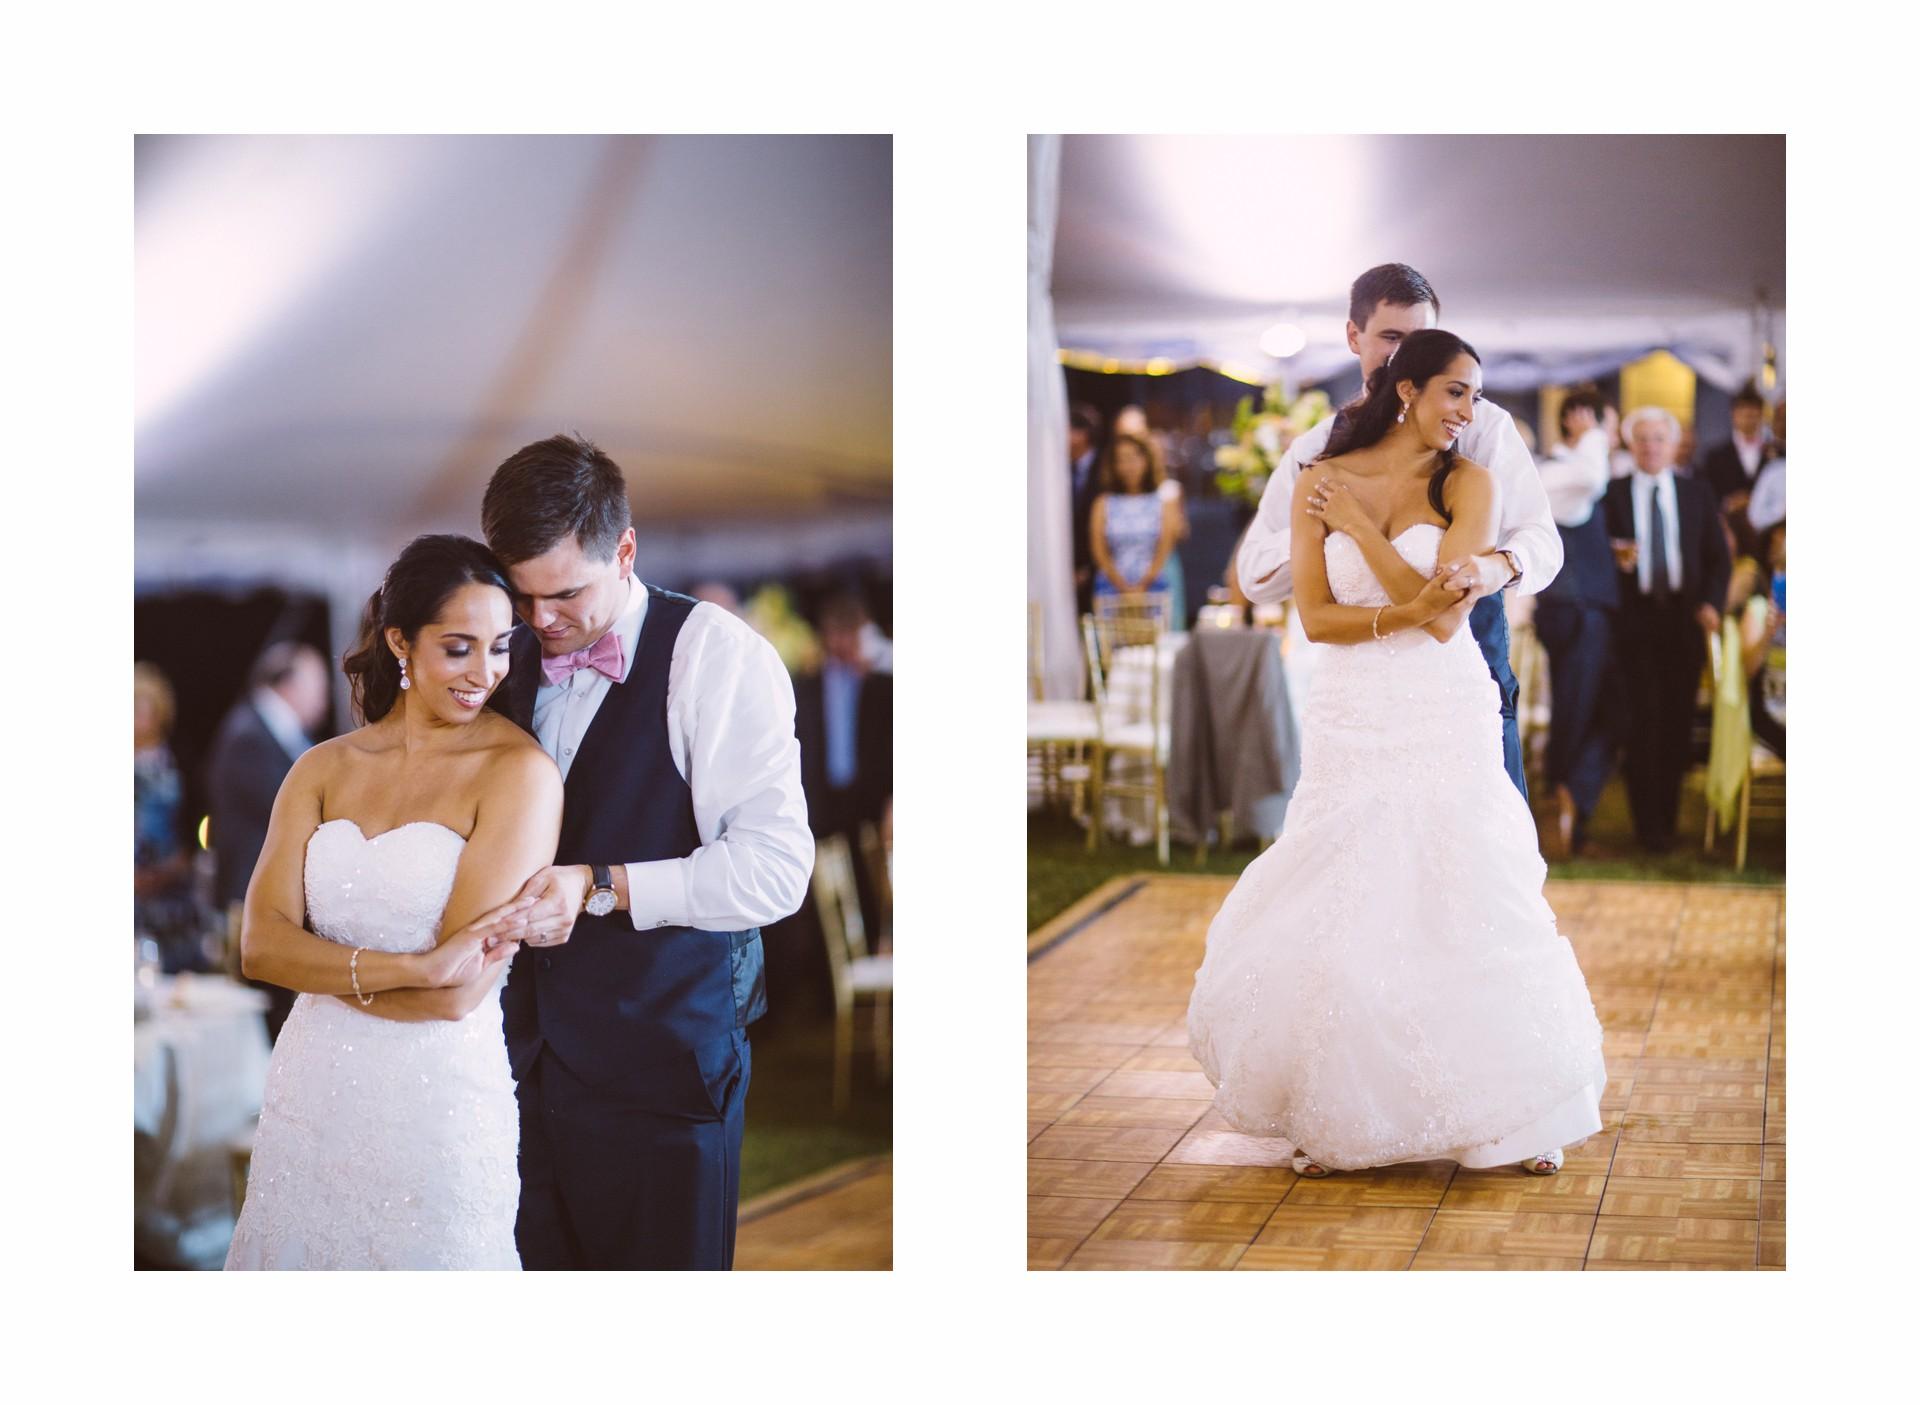 Bolton House Wedding Photographer in Beachwood 78.jpg